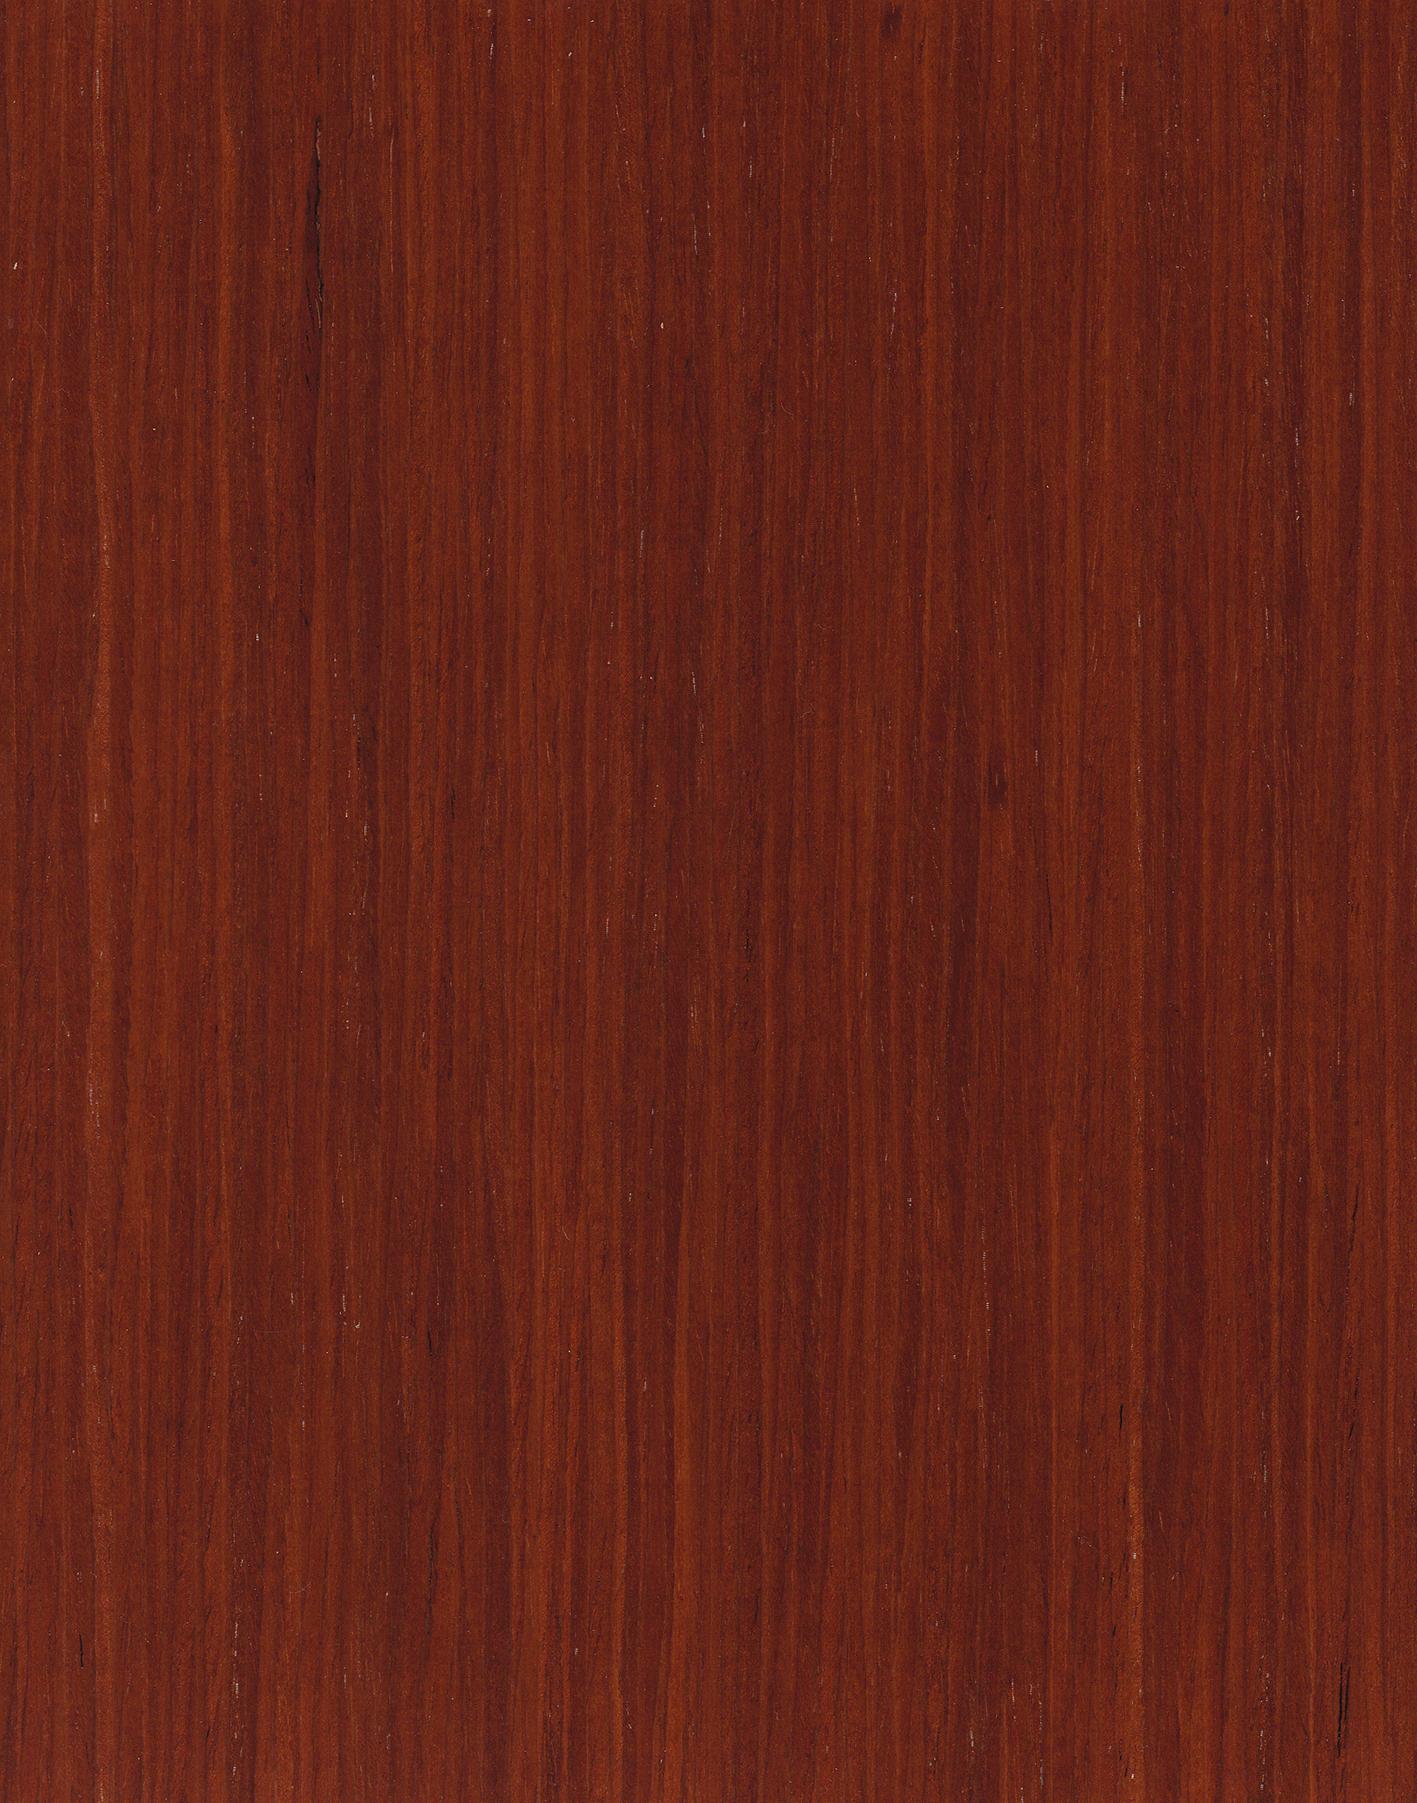 Dark Mahogany Laminate Flooring - dbxkurdistan.com